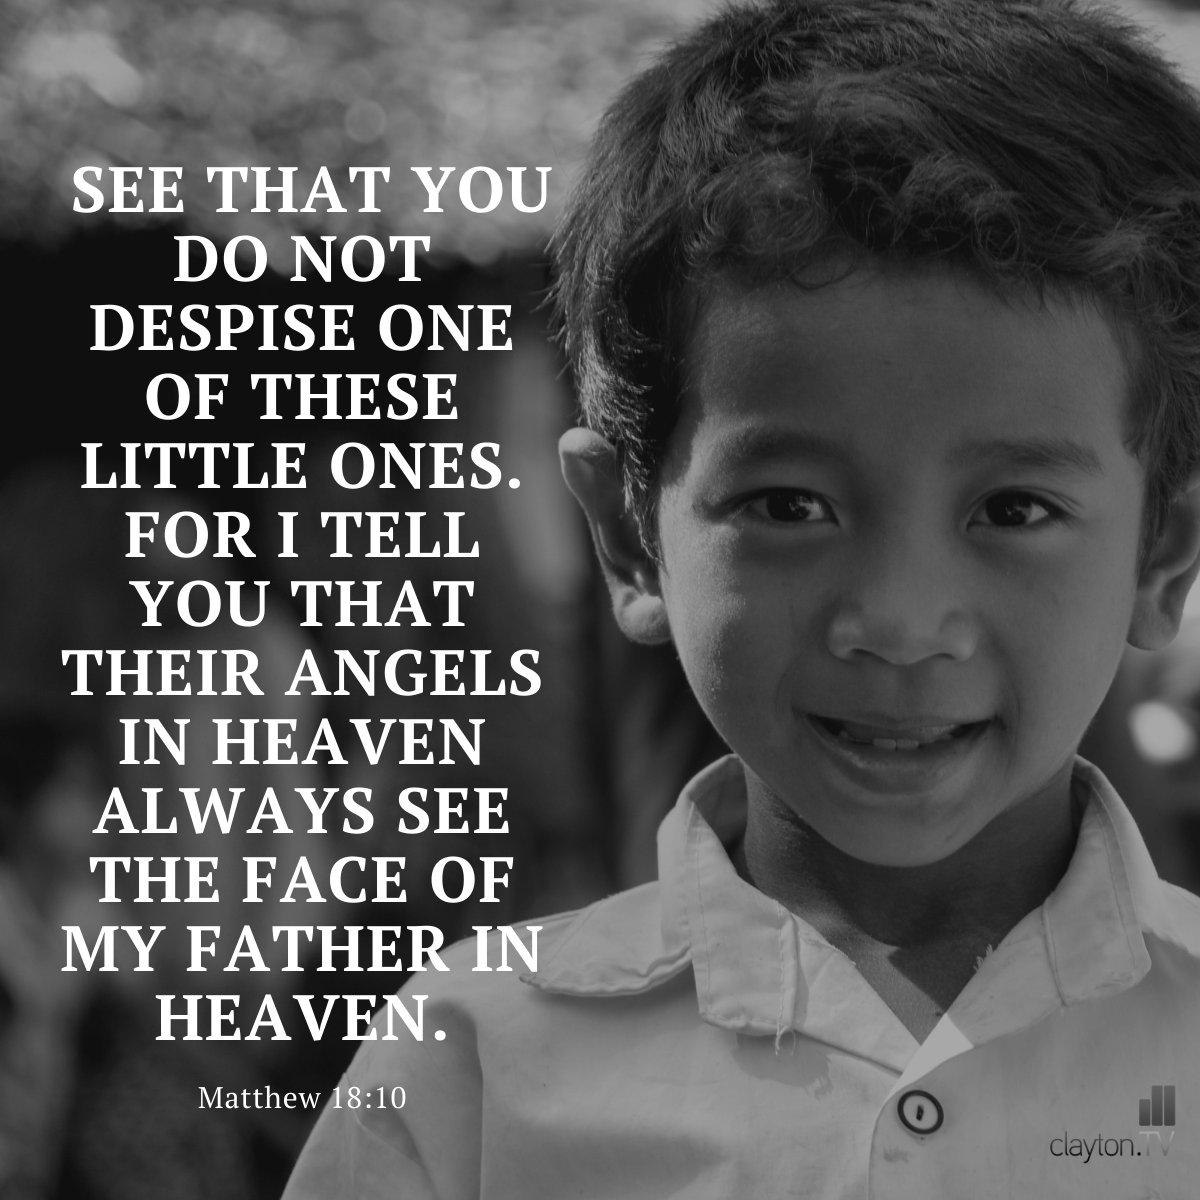 #teamJesus #justice #mission #Bible #preaching #gospel #preach #Christ #WordofGod #Angels #Children